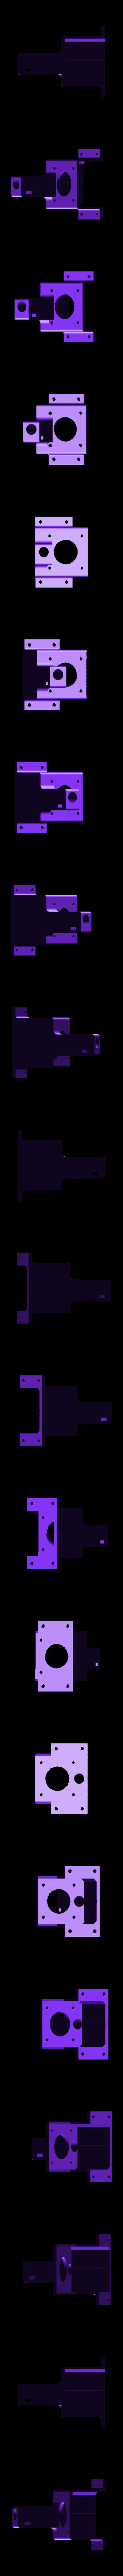 Z_axis_motor_bracket_right.stl Download free STL file Portable 3D Printer • 3D printable design, Job